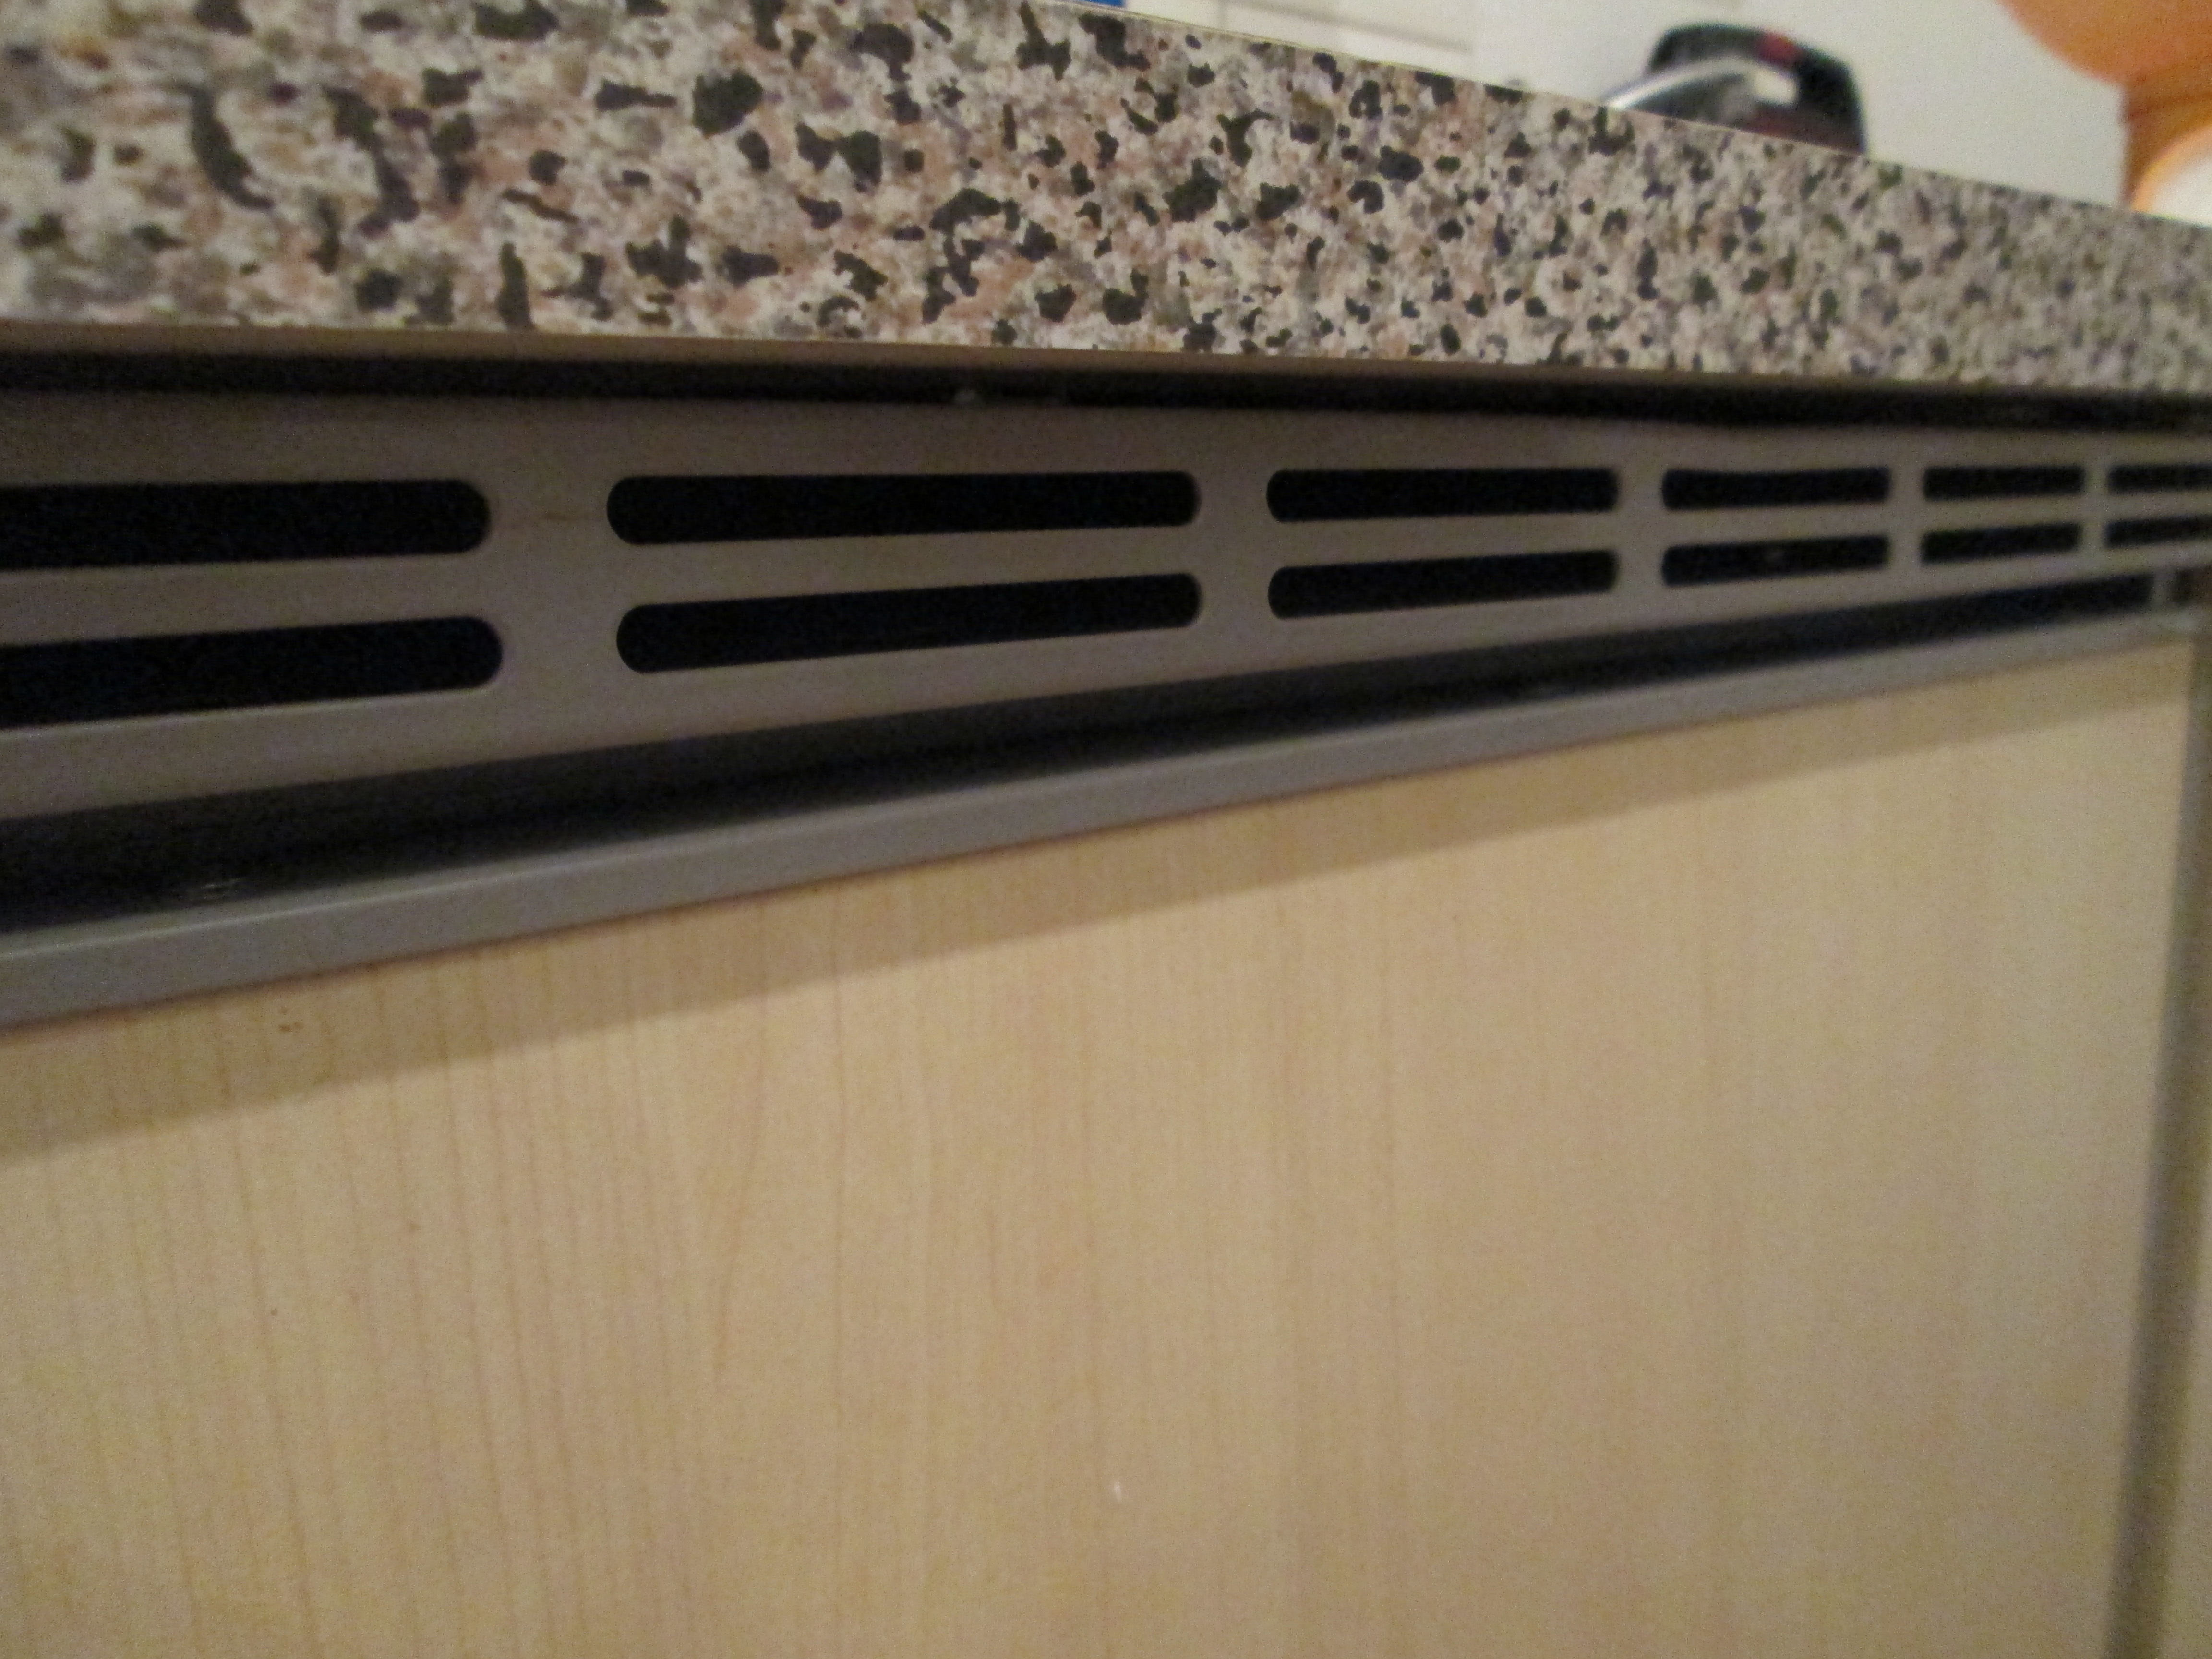 Mini Kühlschrank Bei Real : Kühlschrank real möbel design idee für sie u eu e latofu